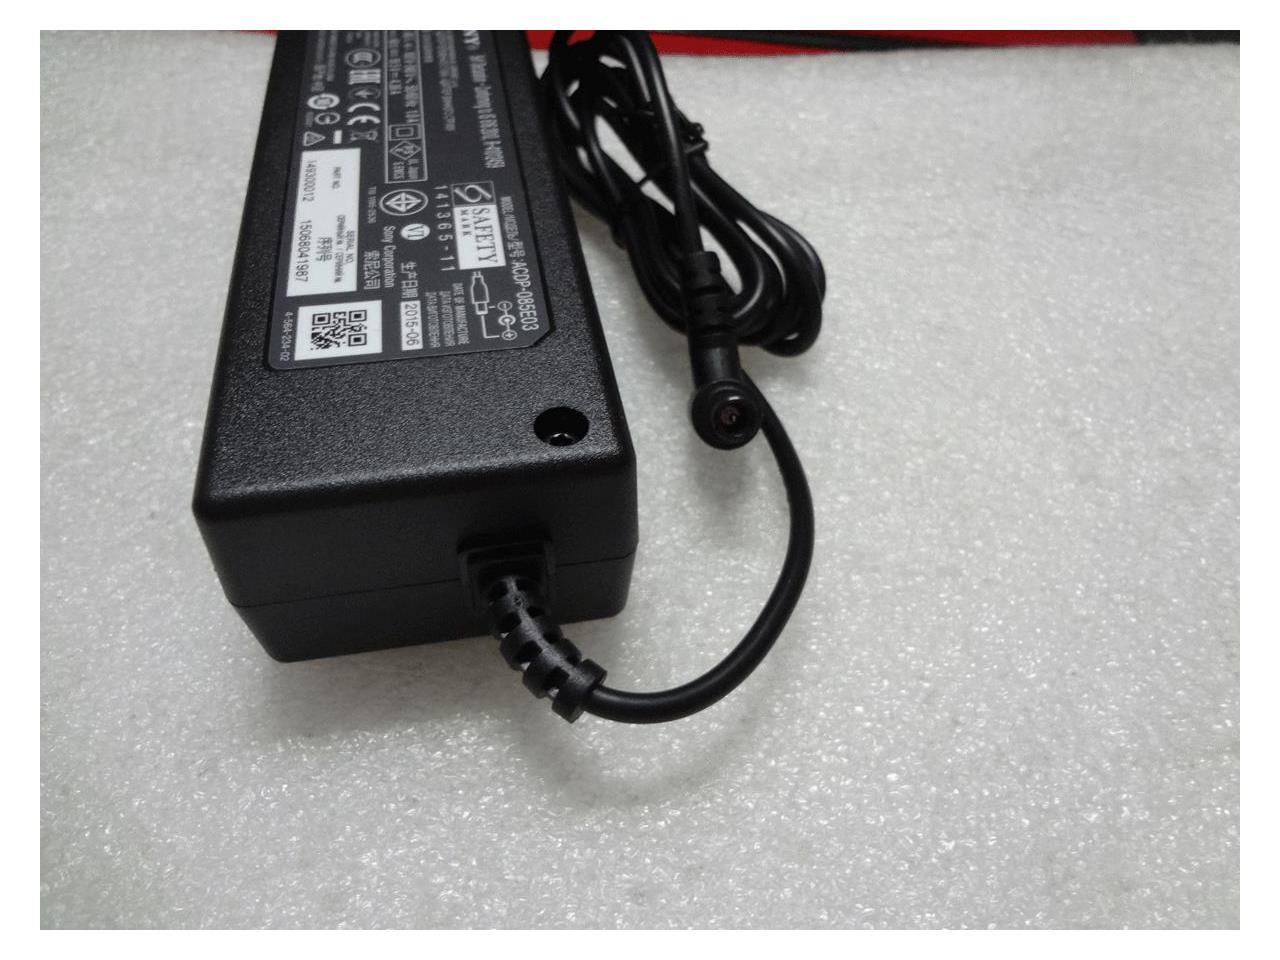 Genuine Original Sony Bravia TV Television Power Adapter Cable Lead ACDP-085E03